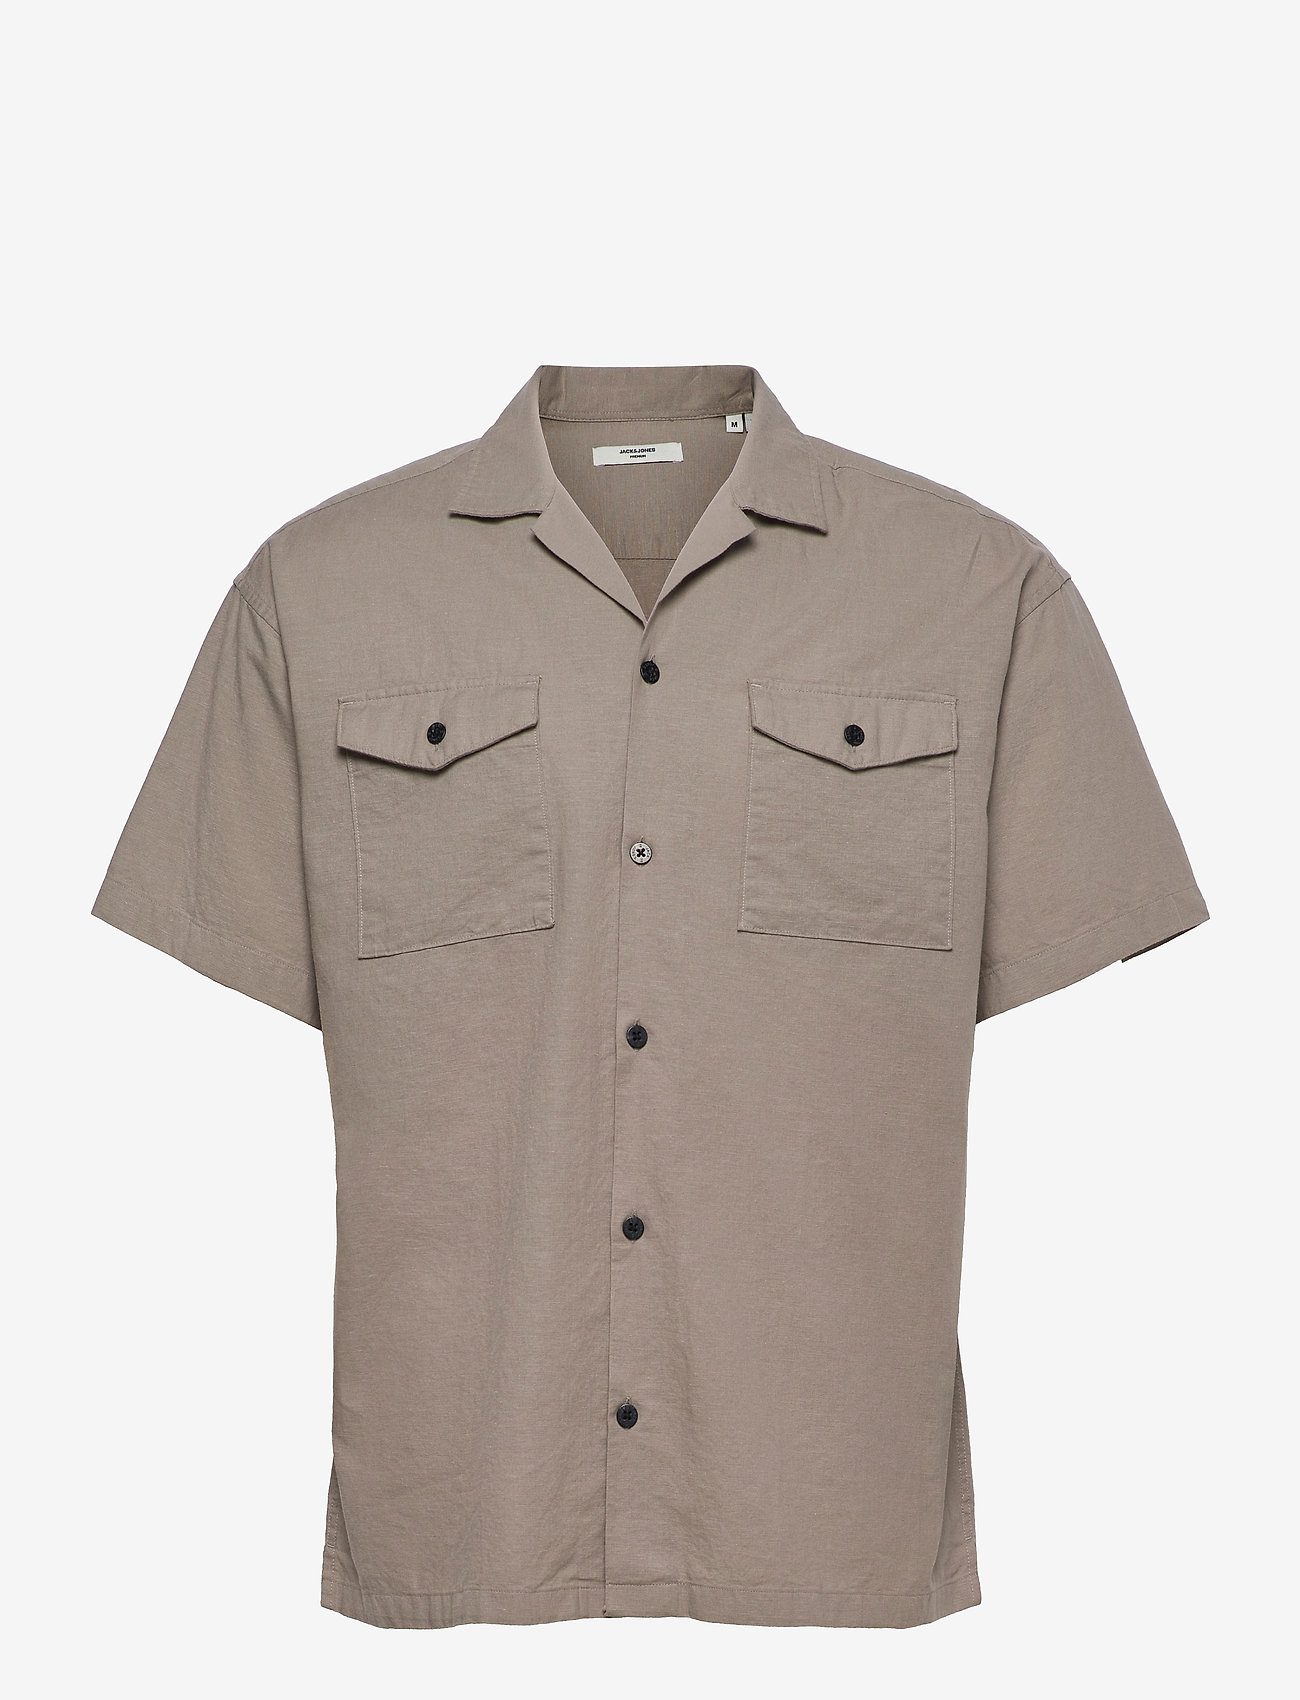 Jack & Jones - JPRBLASUMMER POCKET RESORT SHIRT S/S - basic skjortor - elephant skin - 0